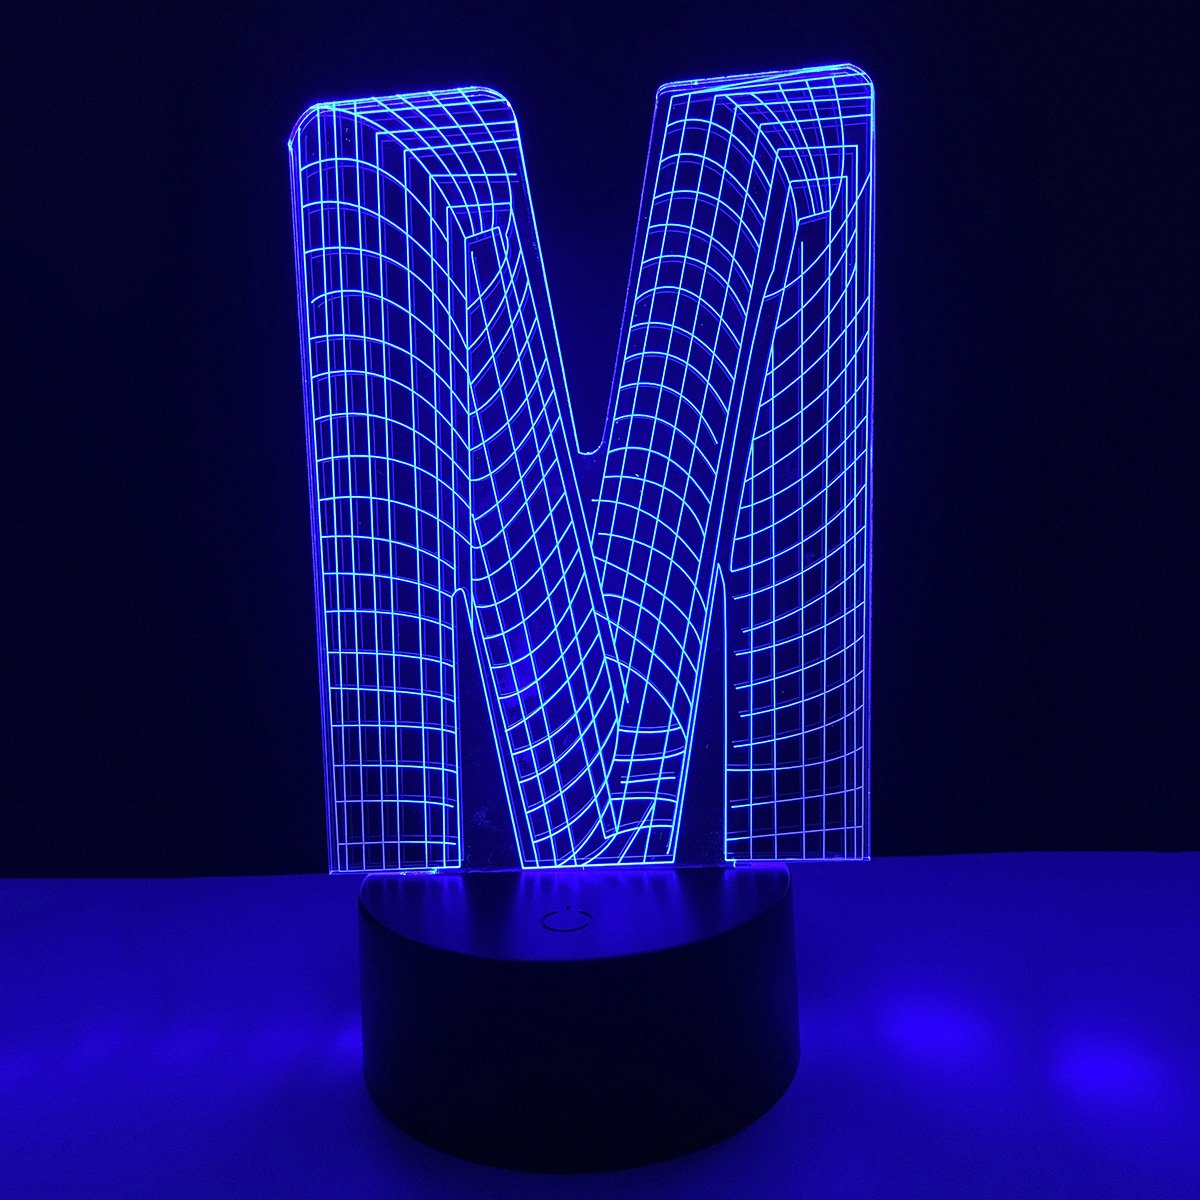 3D Lighting Night Light LED English Letter Alphabet Lamp with USB Power Optical Illusion Visual Table Desk Lamp 7 Colors Touch Table Desk Lamp Home Office Childrenroom Living Bar Theme Light (M)